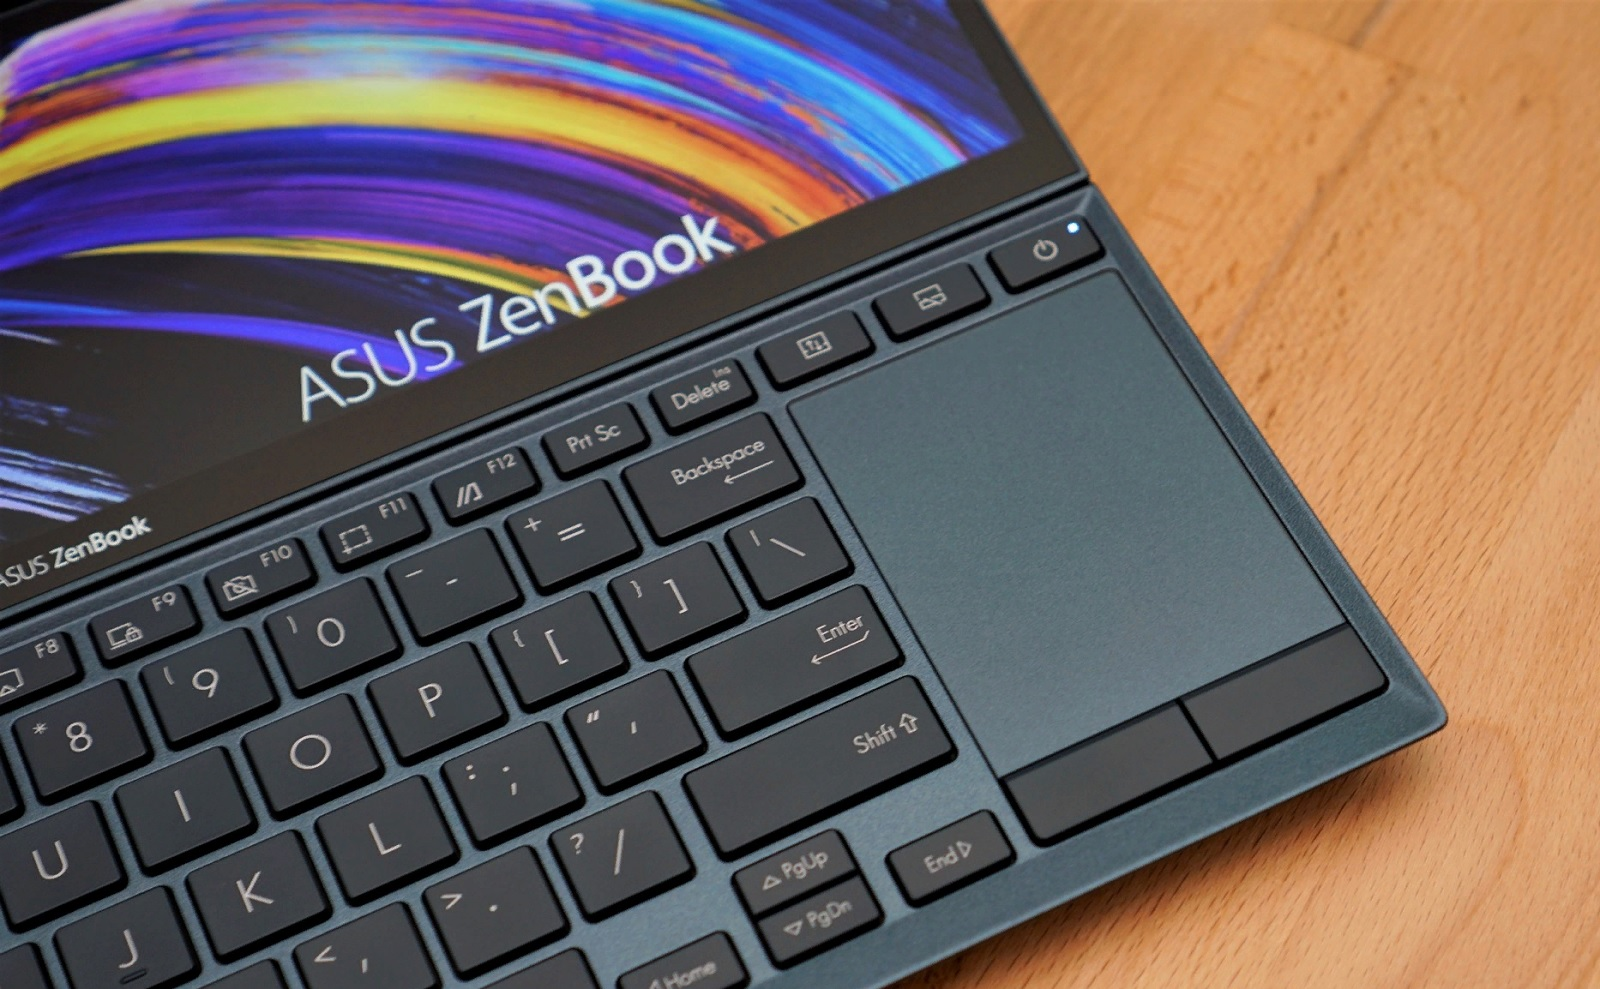 Disadvantages of ASUS ZenBook Duo